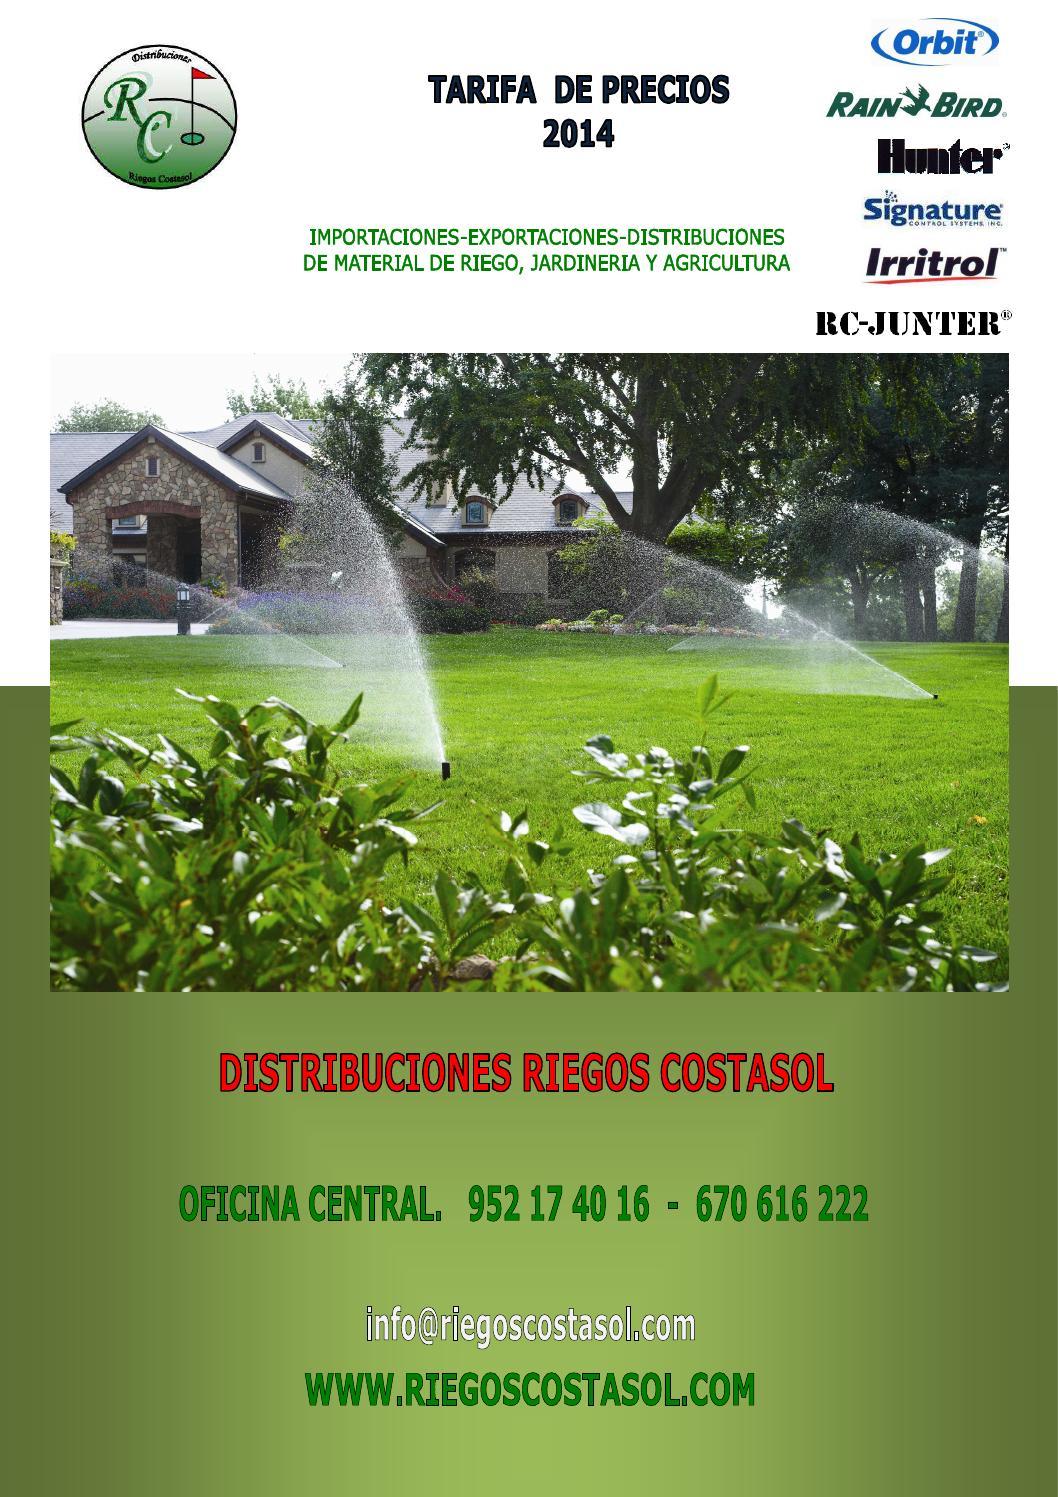 x5 TOBERA DIFUSOR DE RIEGO 15VAN RAIN BIRD JARDIN BOQUILLA 4,50 MT REGULABLE